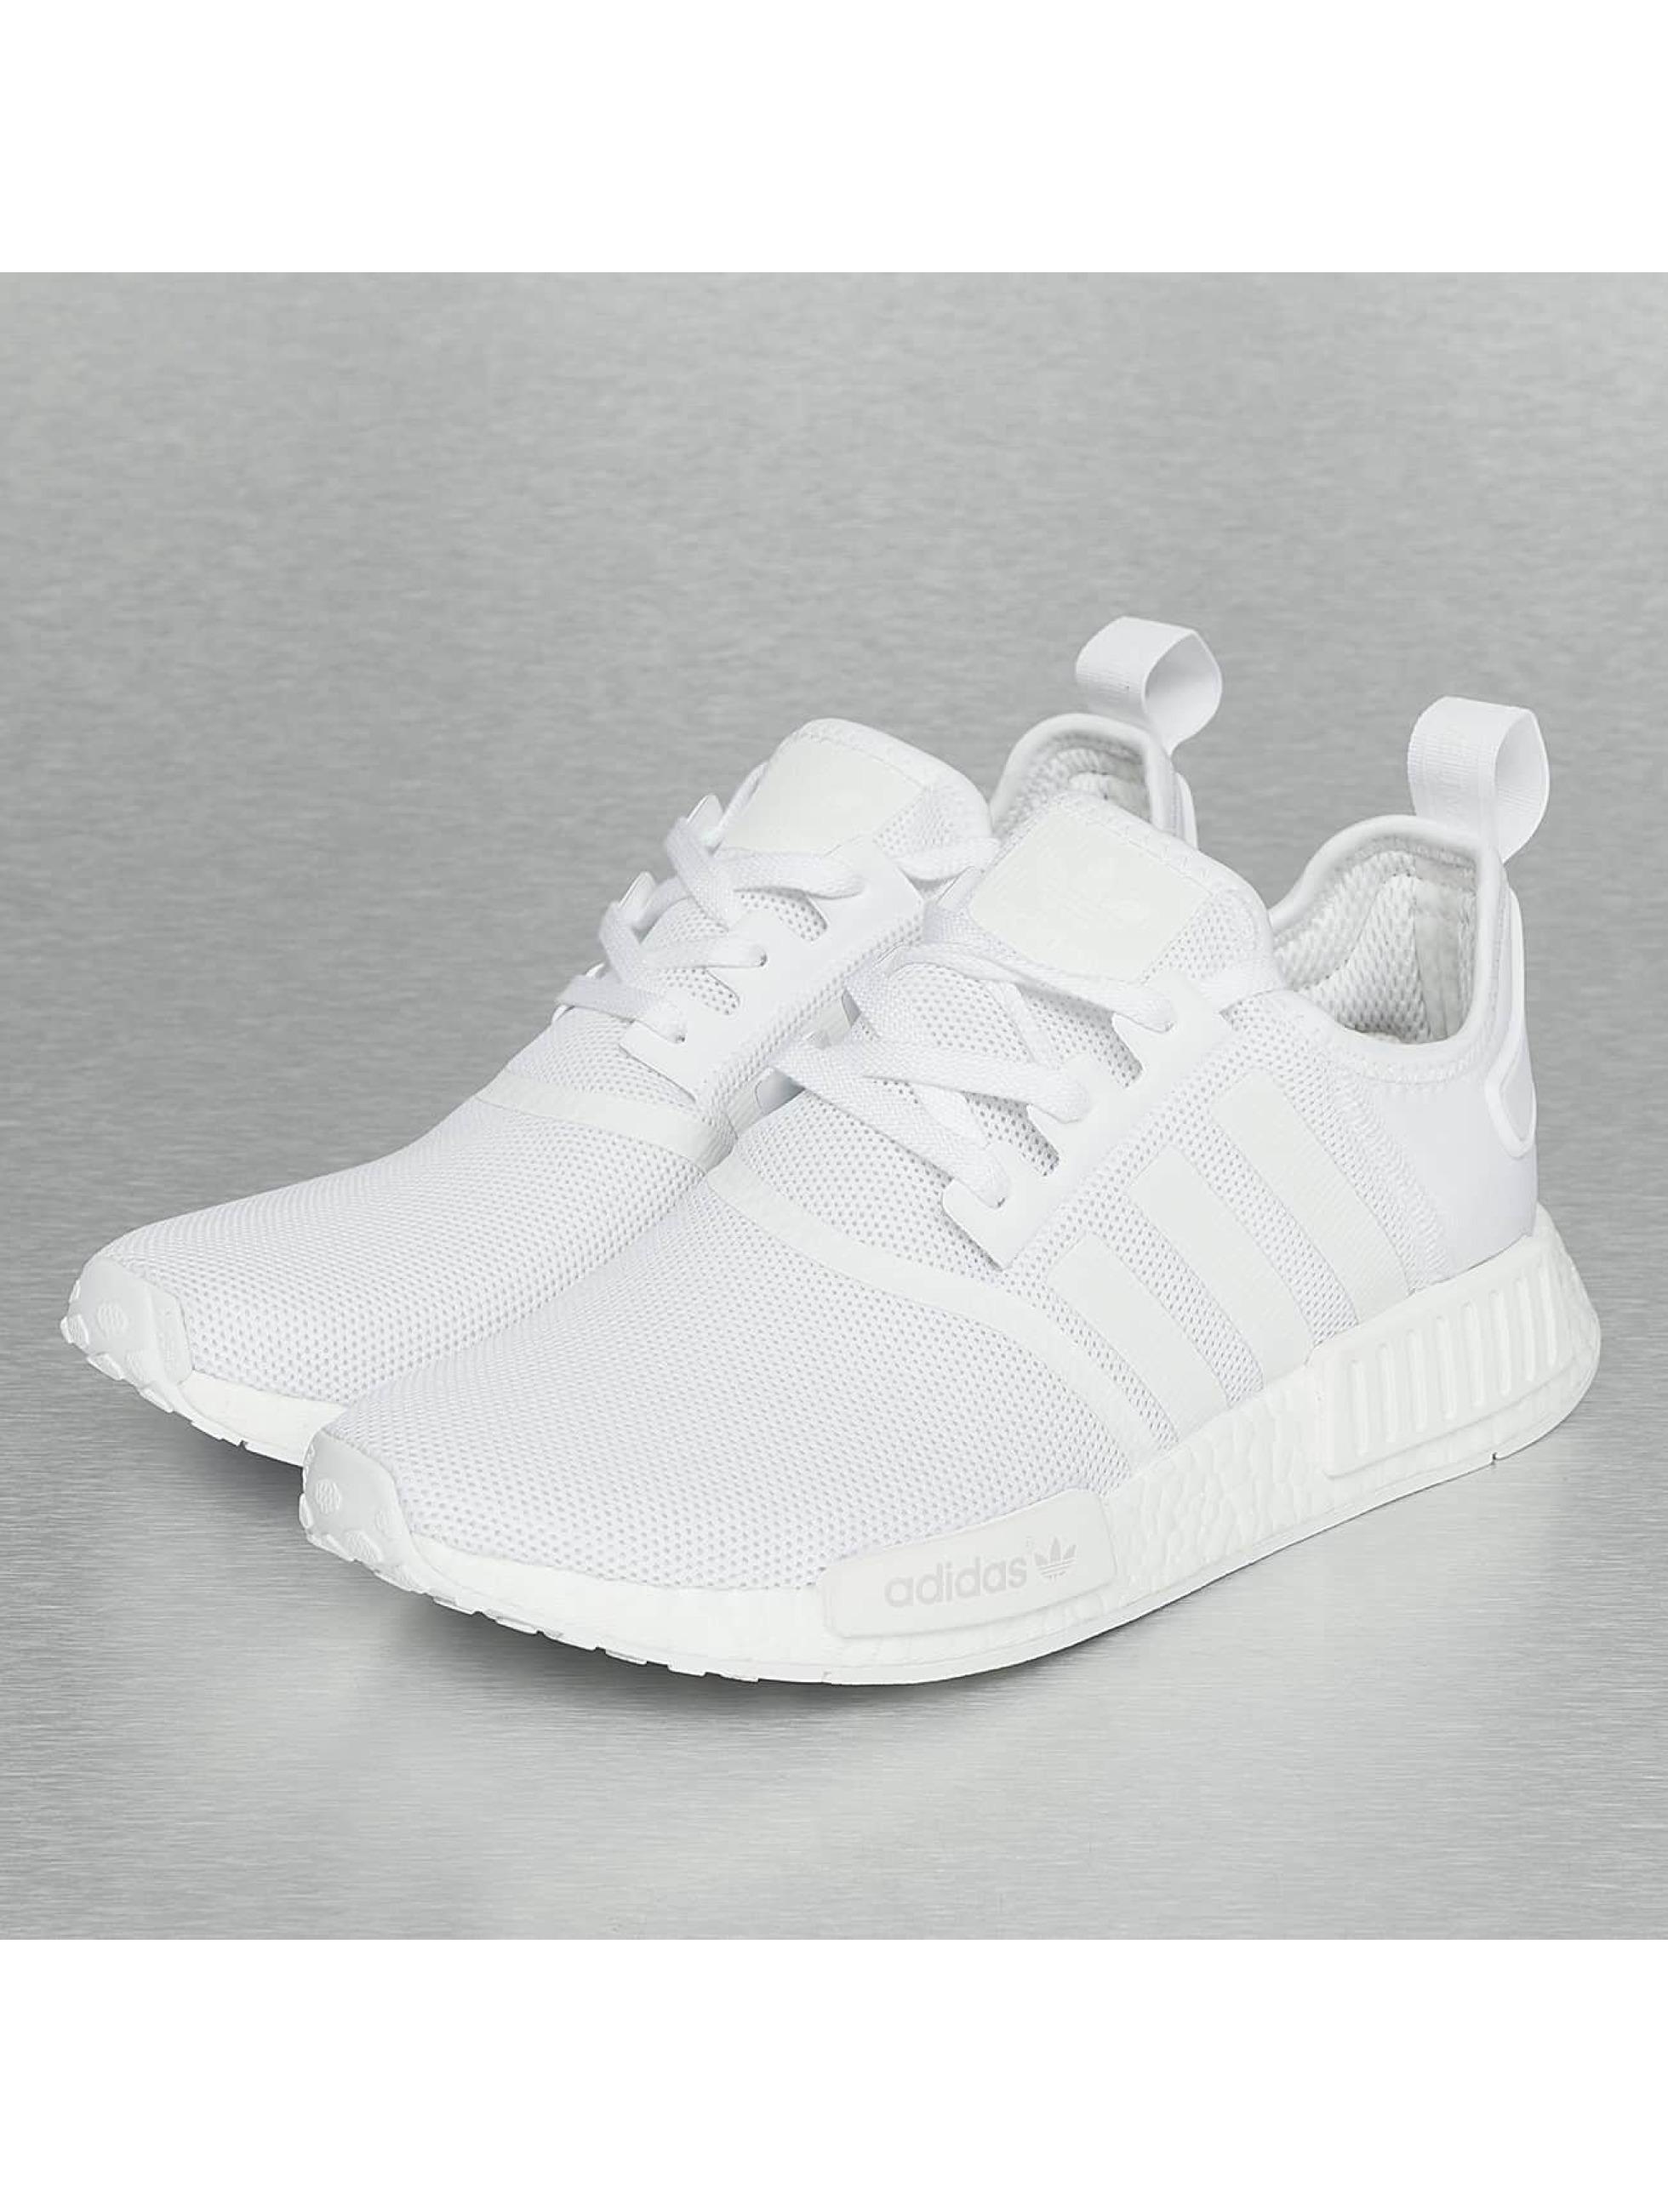 adidas damen schuhe sneaker nmd  ebay